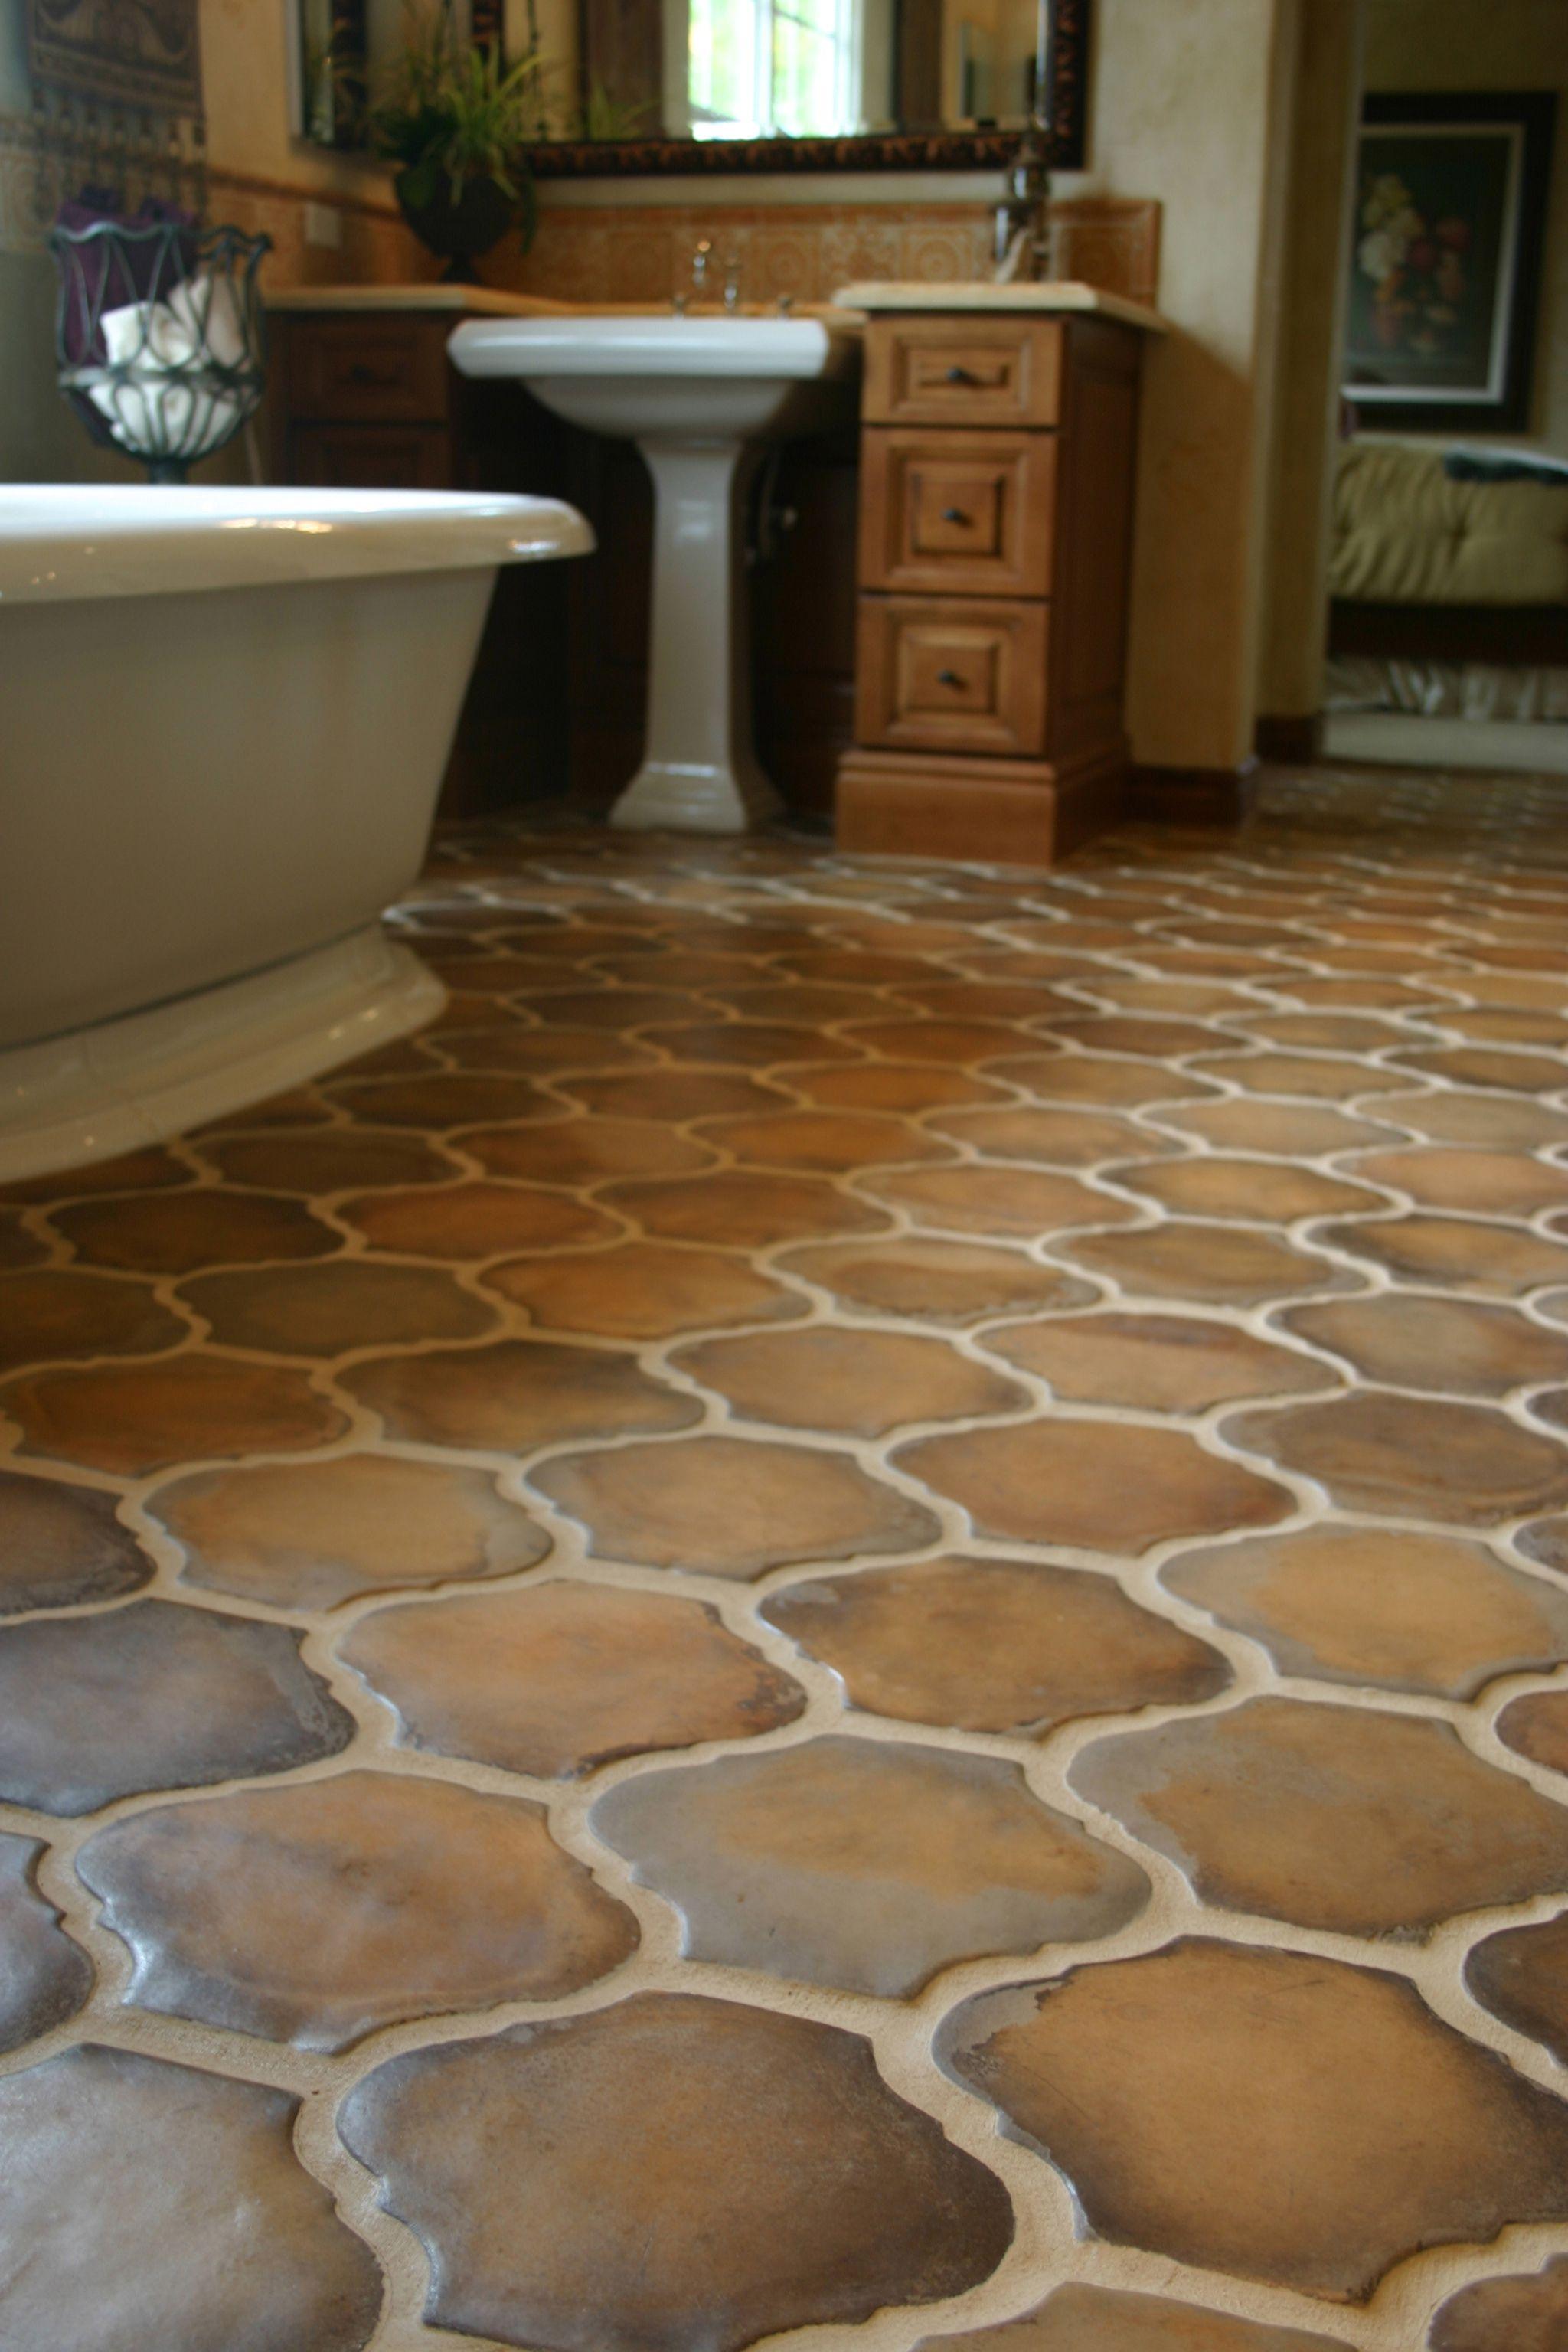 Ann Sacks Hacienda 9 X 11 1 4 San Felipe Pillowed Concrete Field In Tuscan Mustard Flooring Terracotta Floor Ann Sacks Tiles